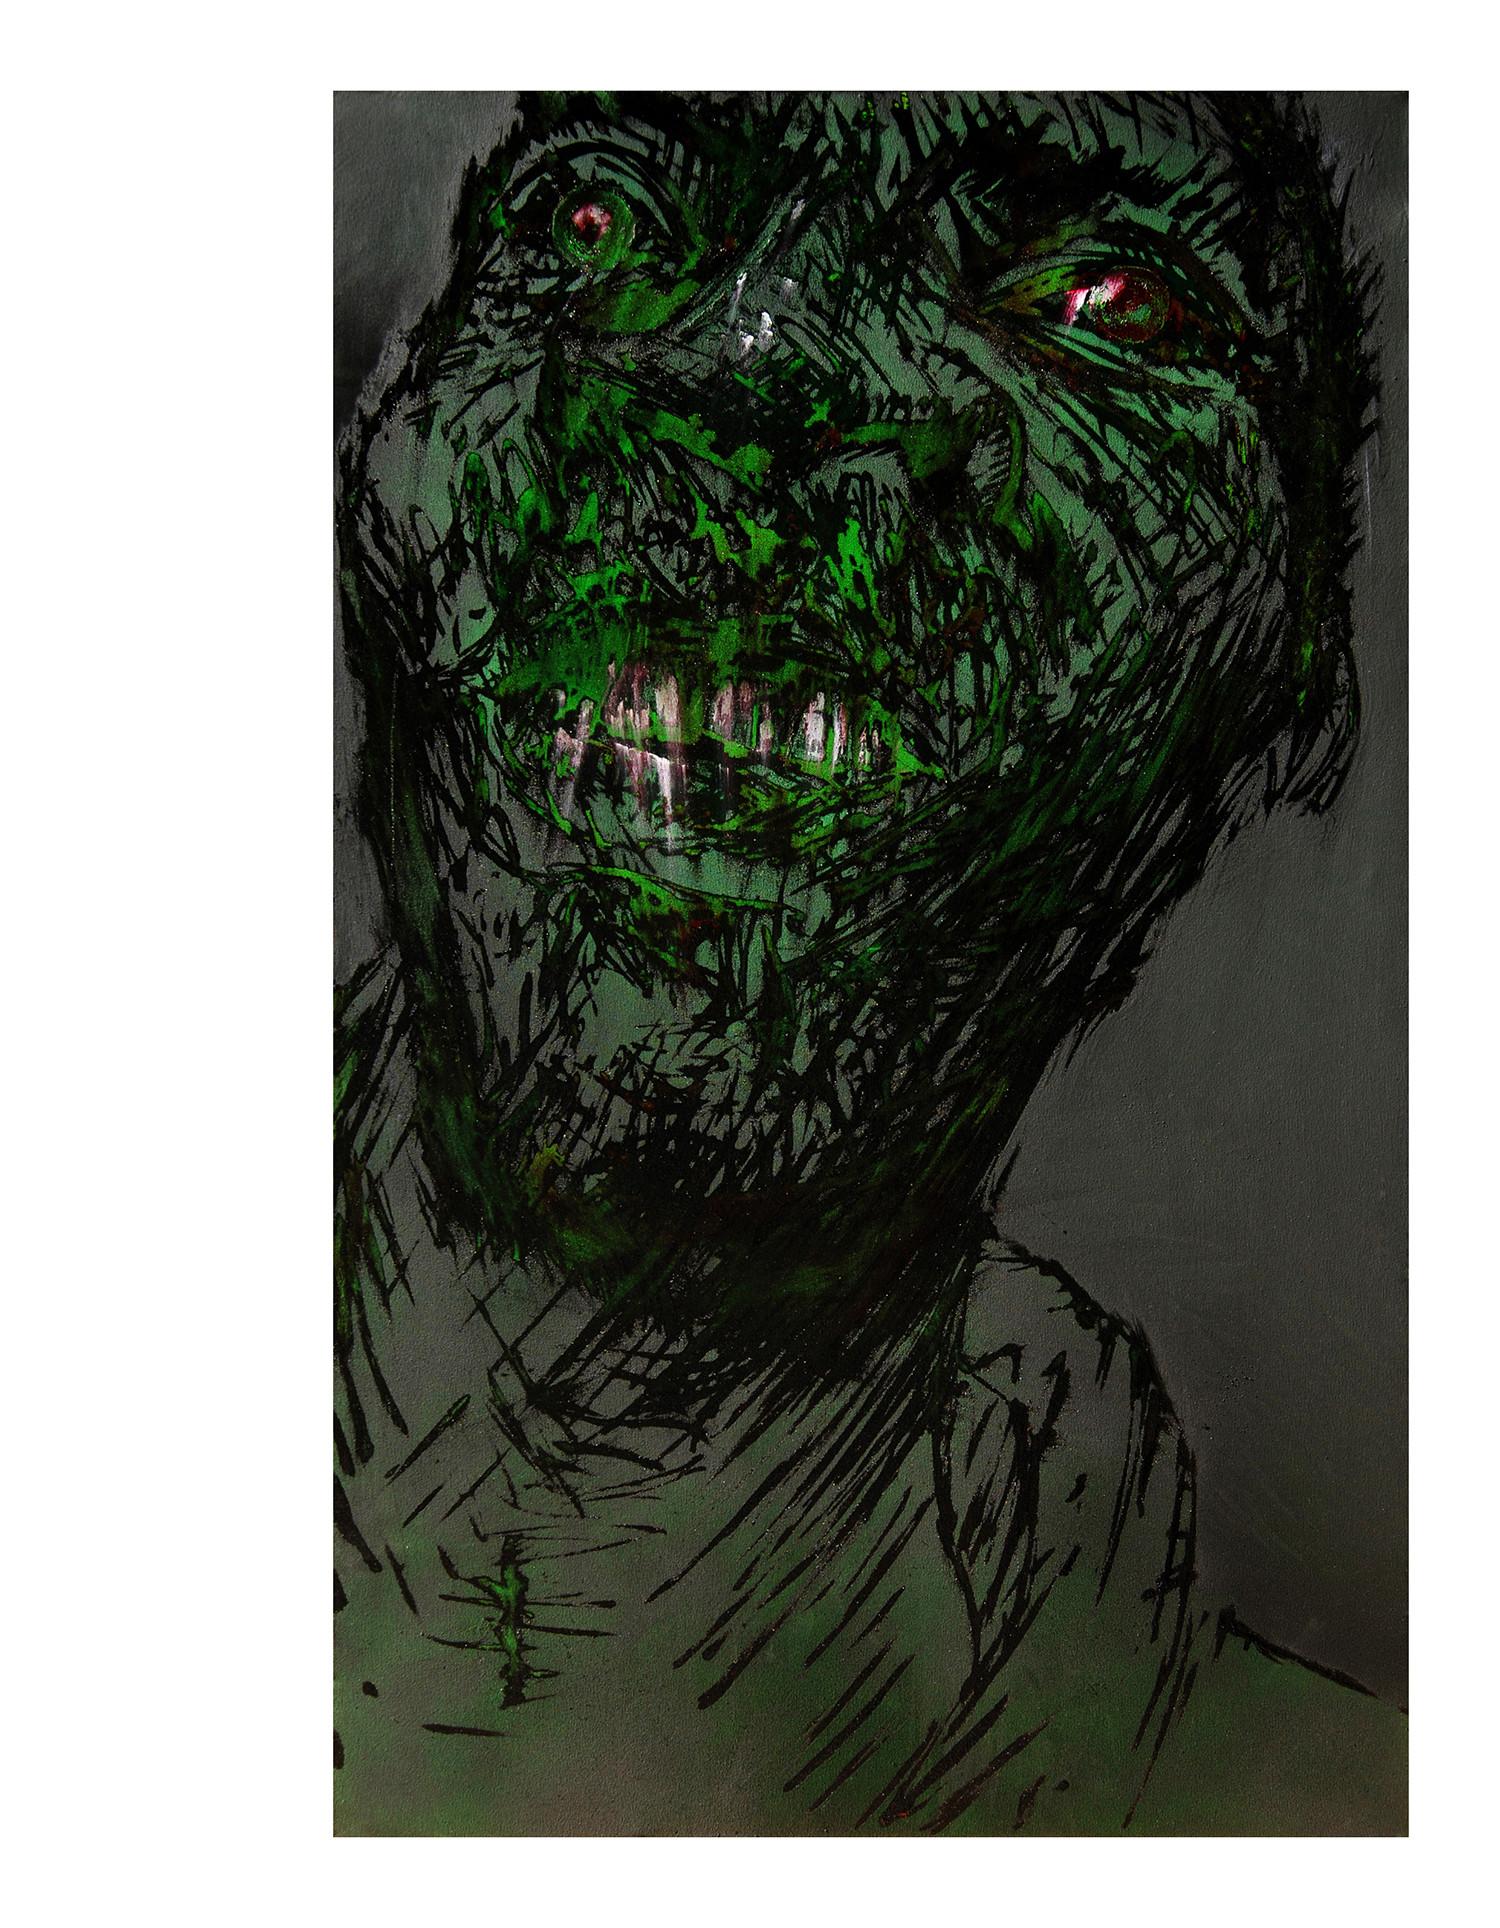 Mario Benjamin, sans titre, acrylic mix media on canvas